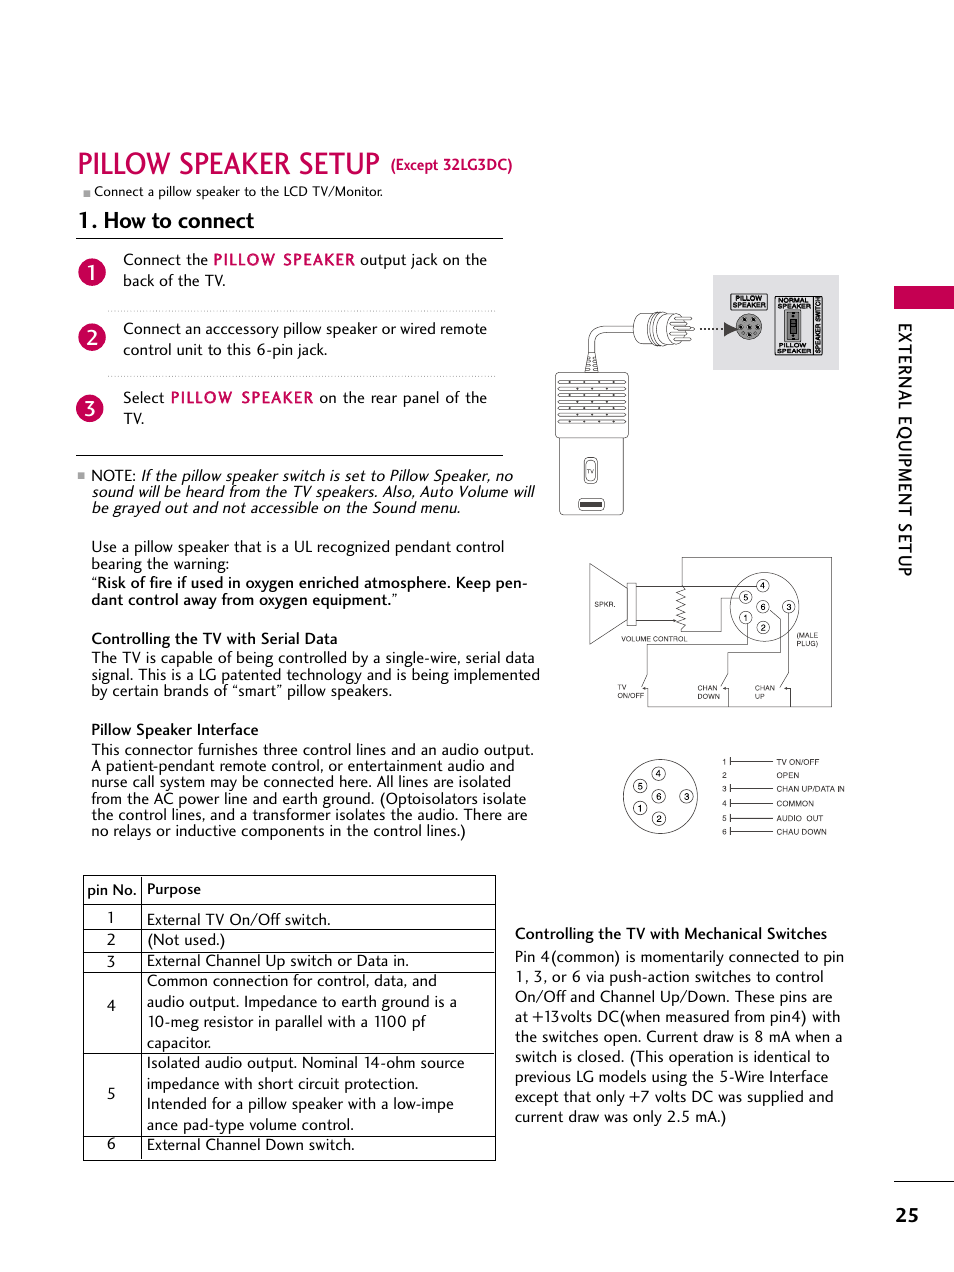 Pillow speaker setup, How to connect, External eq uipment setup | LG